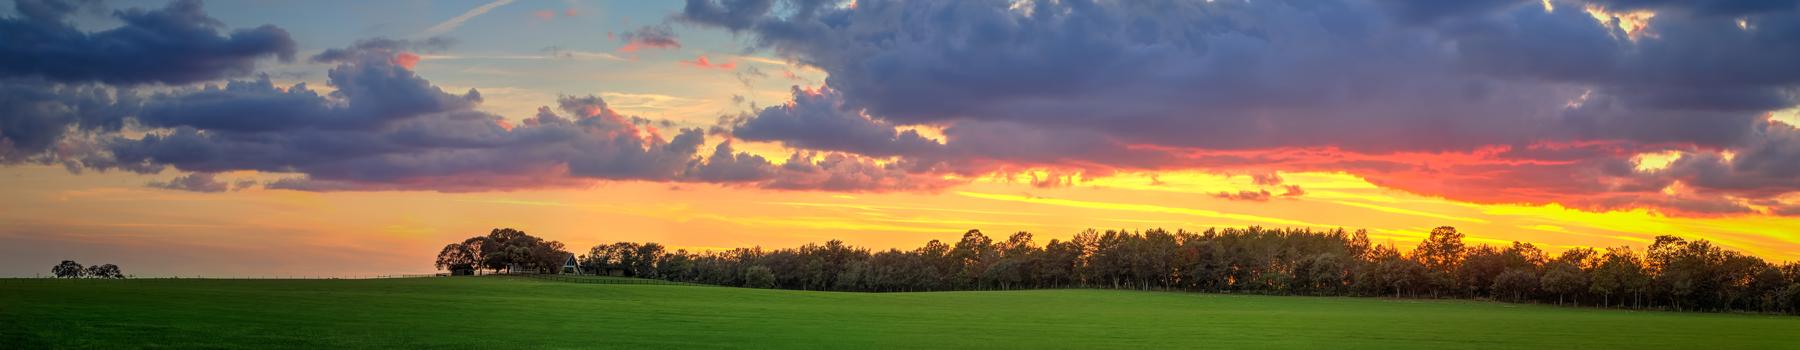 Green Pasture Grassy Farm Land Gainesville Florida